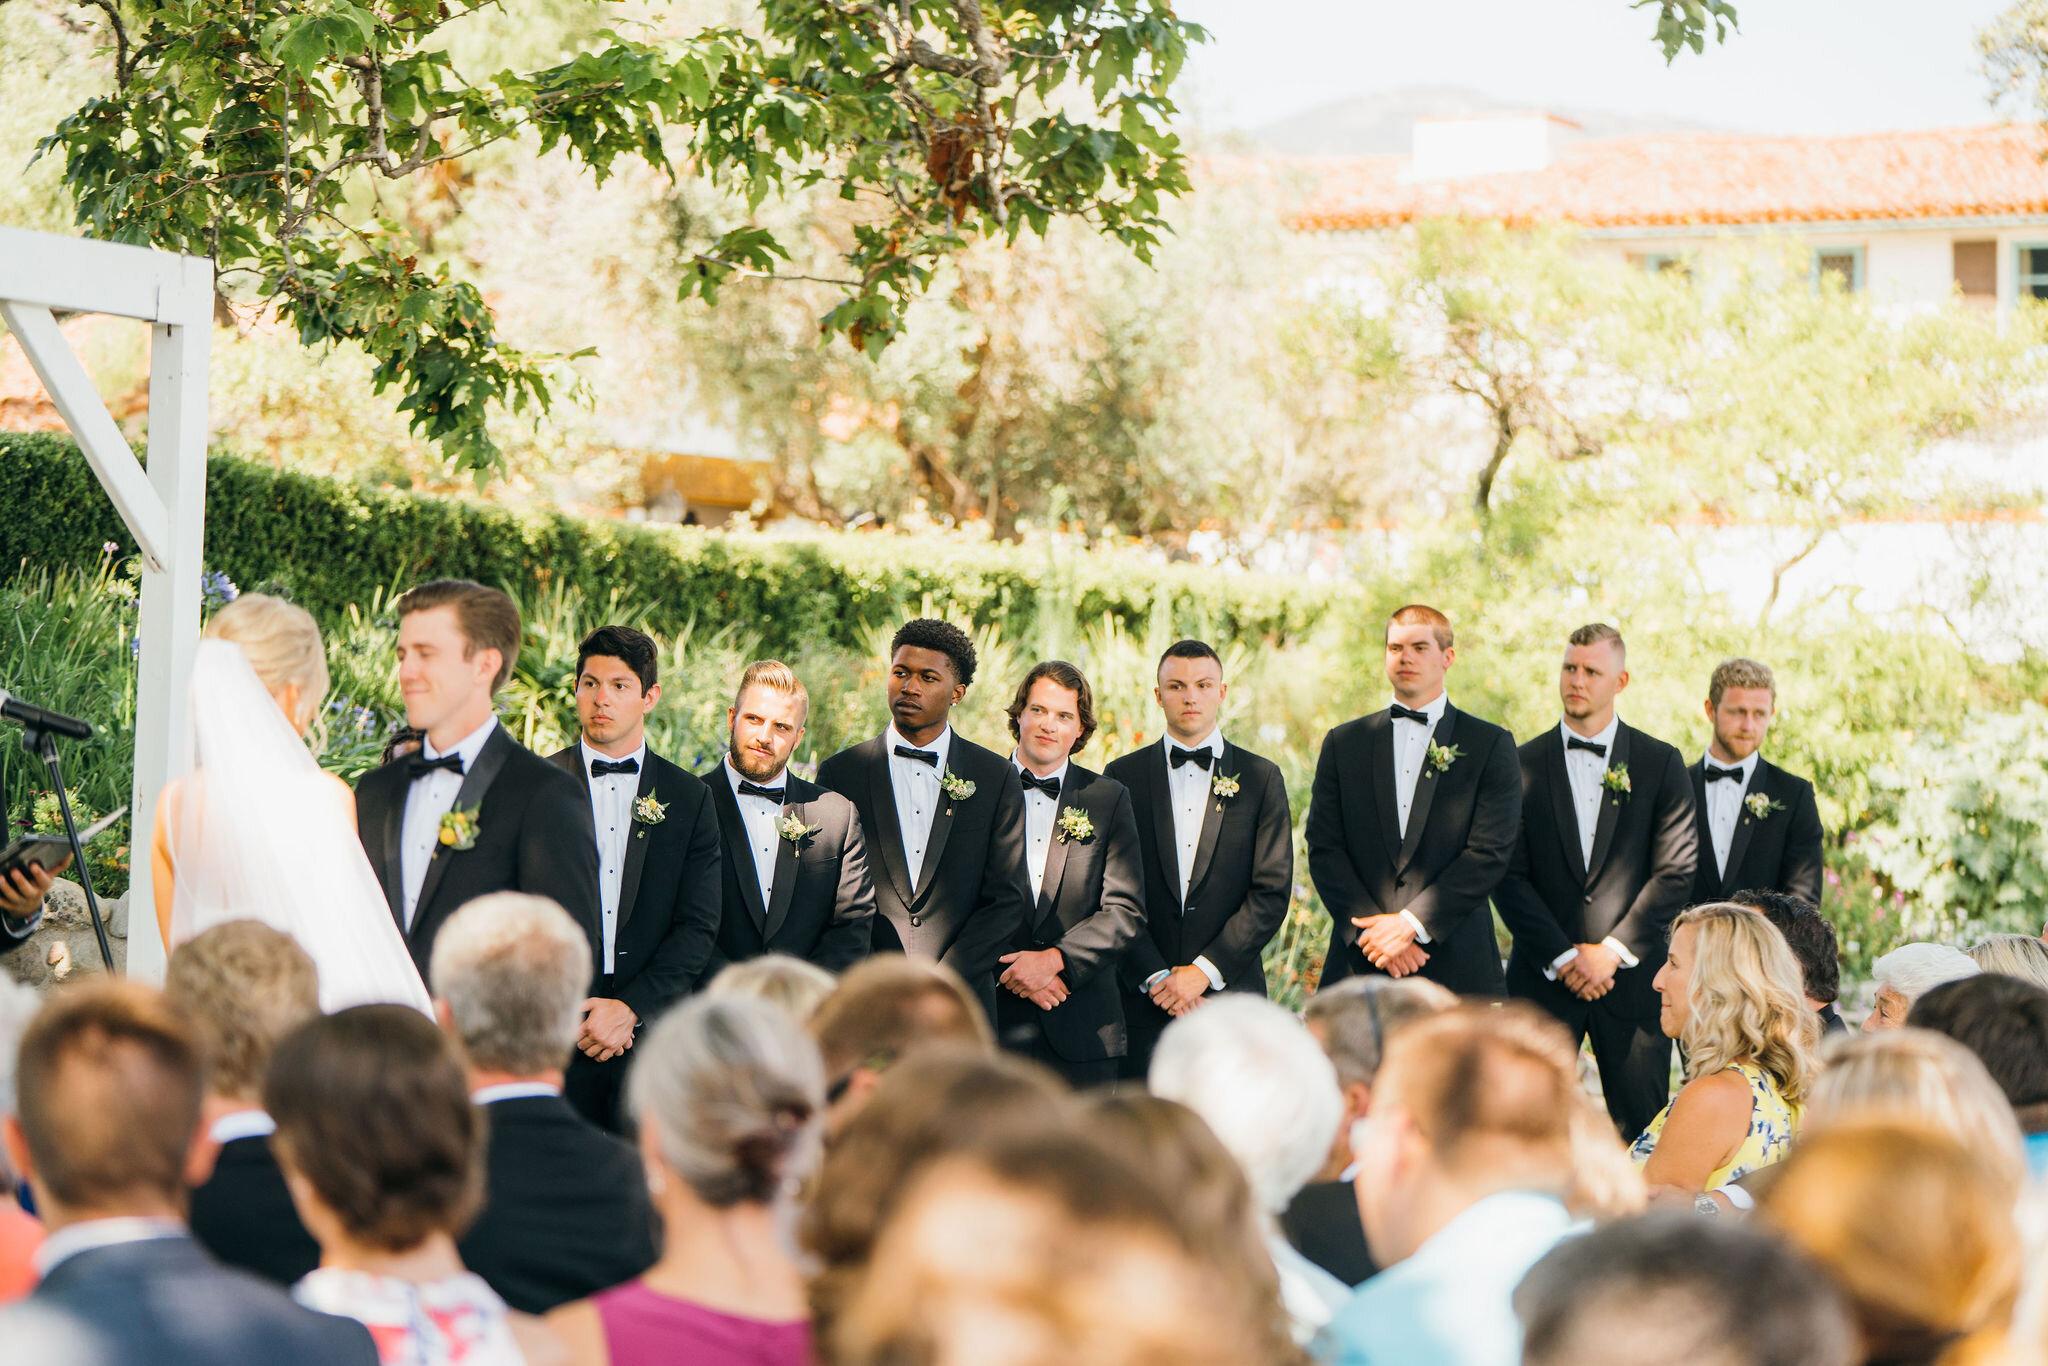 adamson-house-wedding-photography-078.jpg